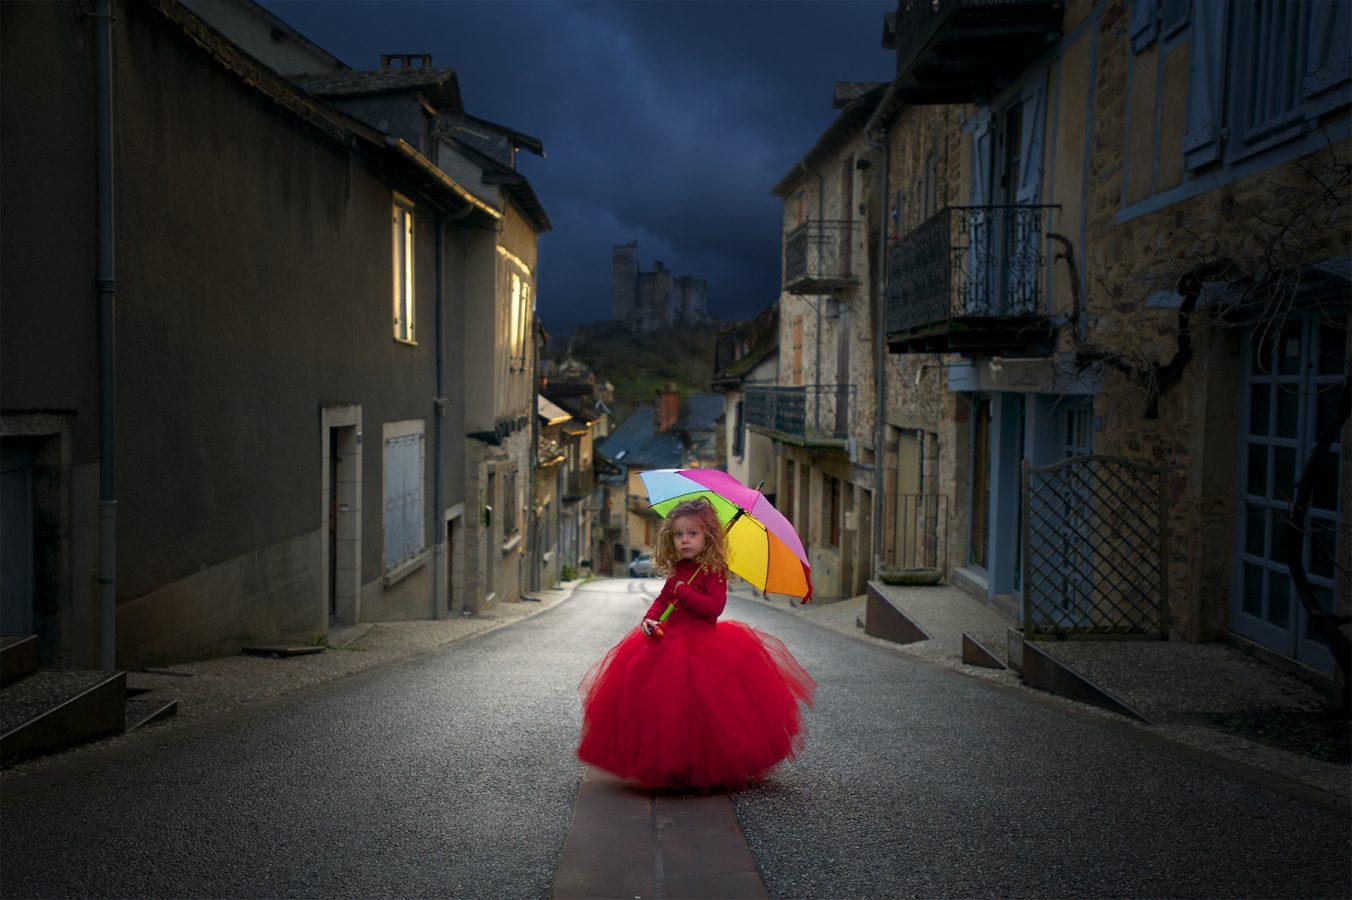 La princesse de Najac, Sandrine Bonvoisin, photographe de mariage.